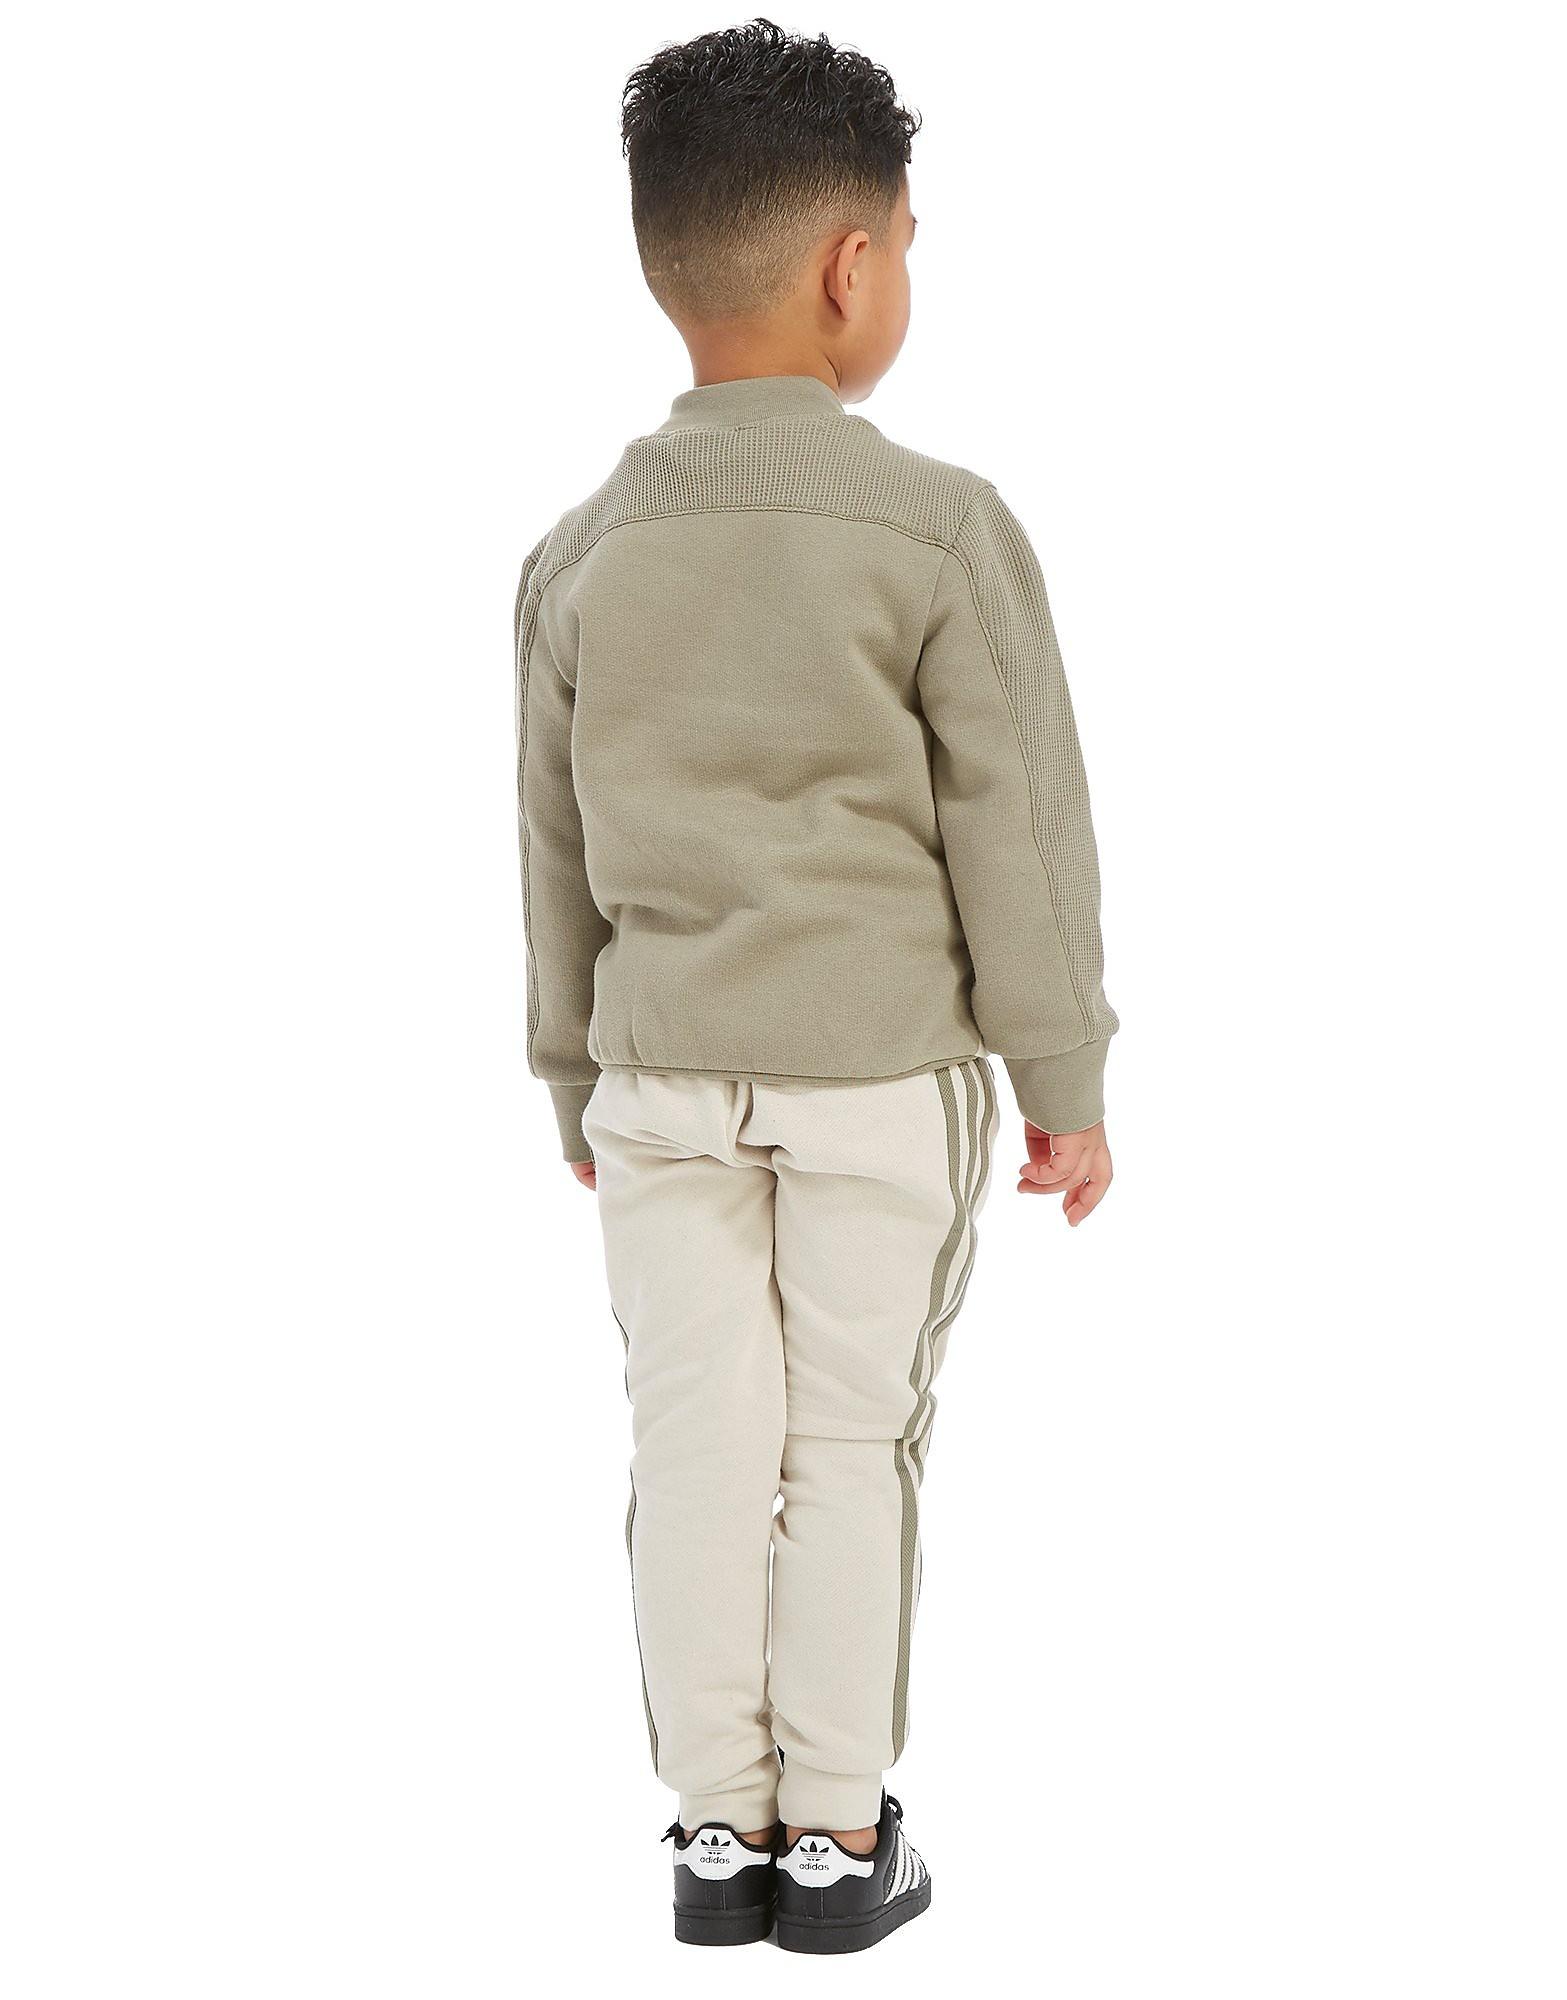 adidas Originals MOA Fleece Superstar Tracksuit Children